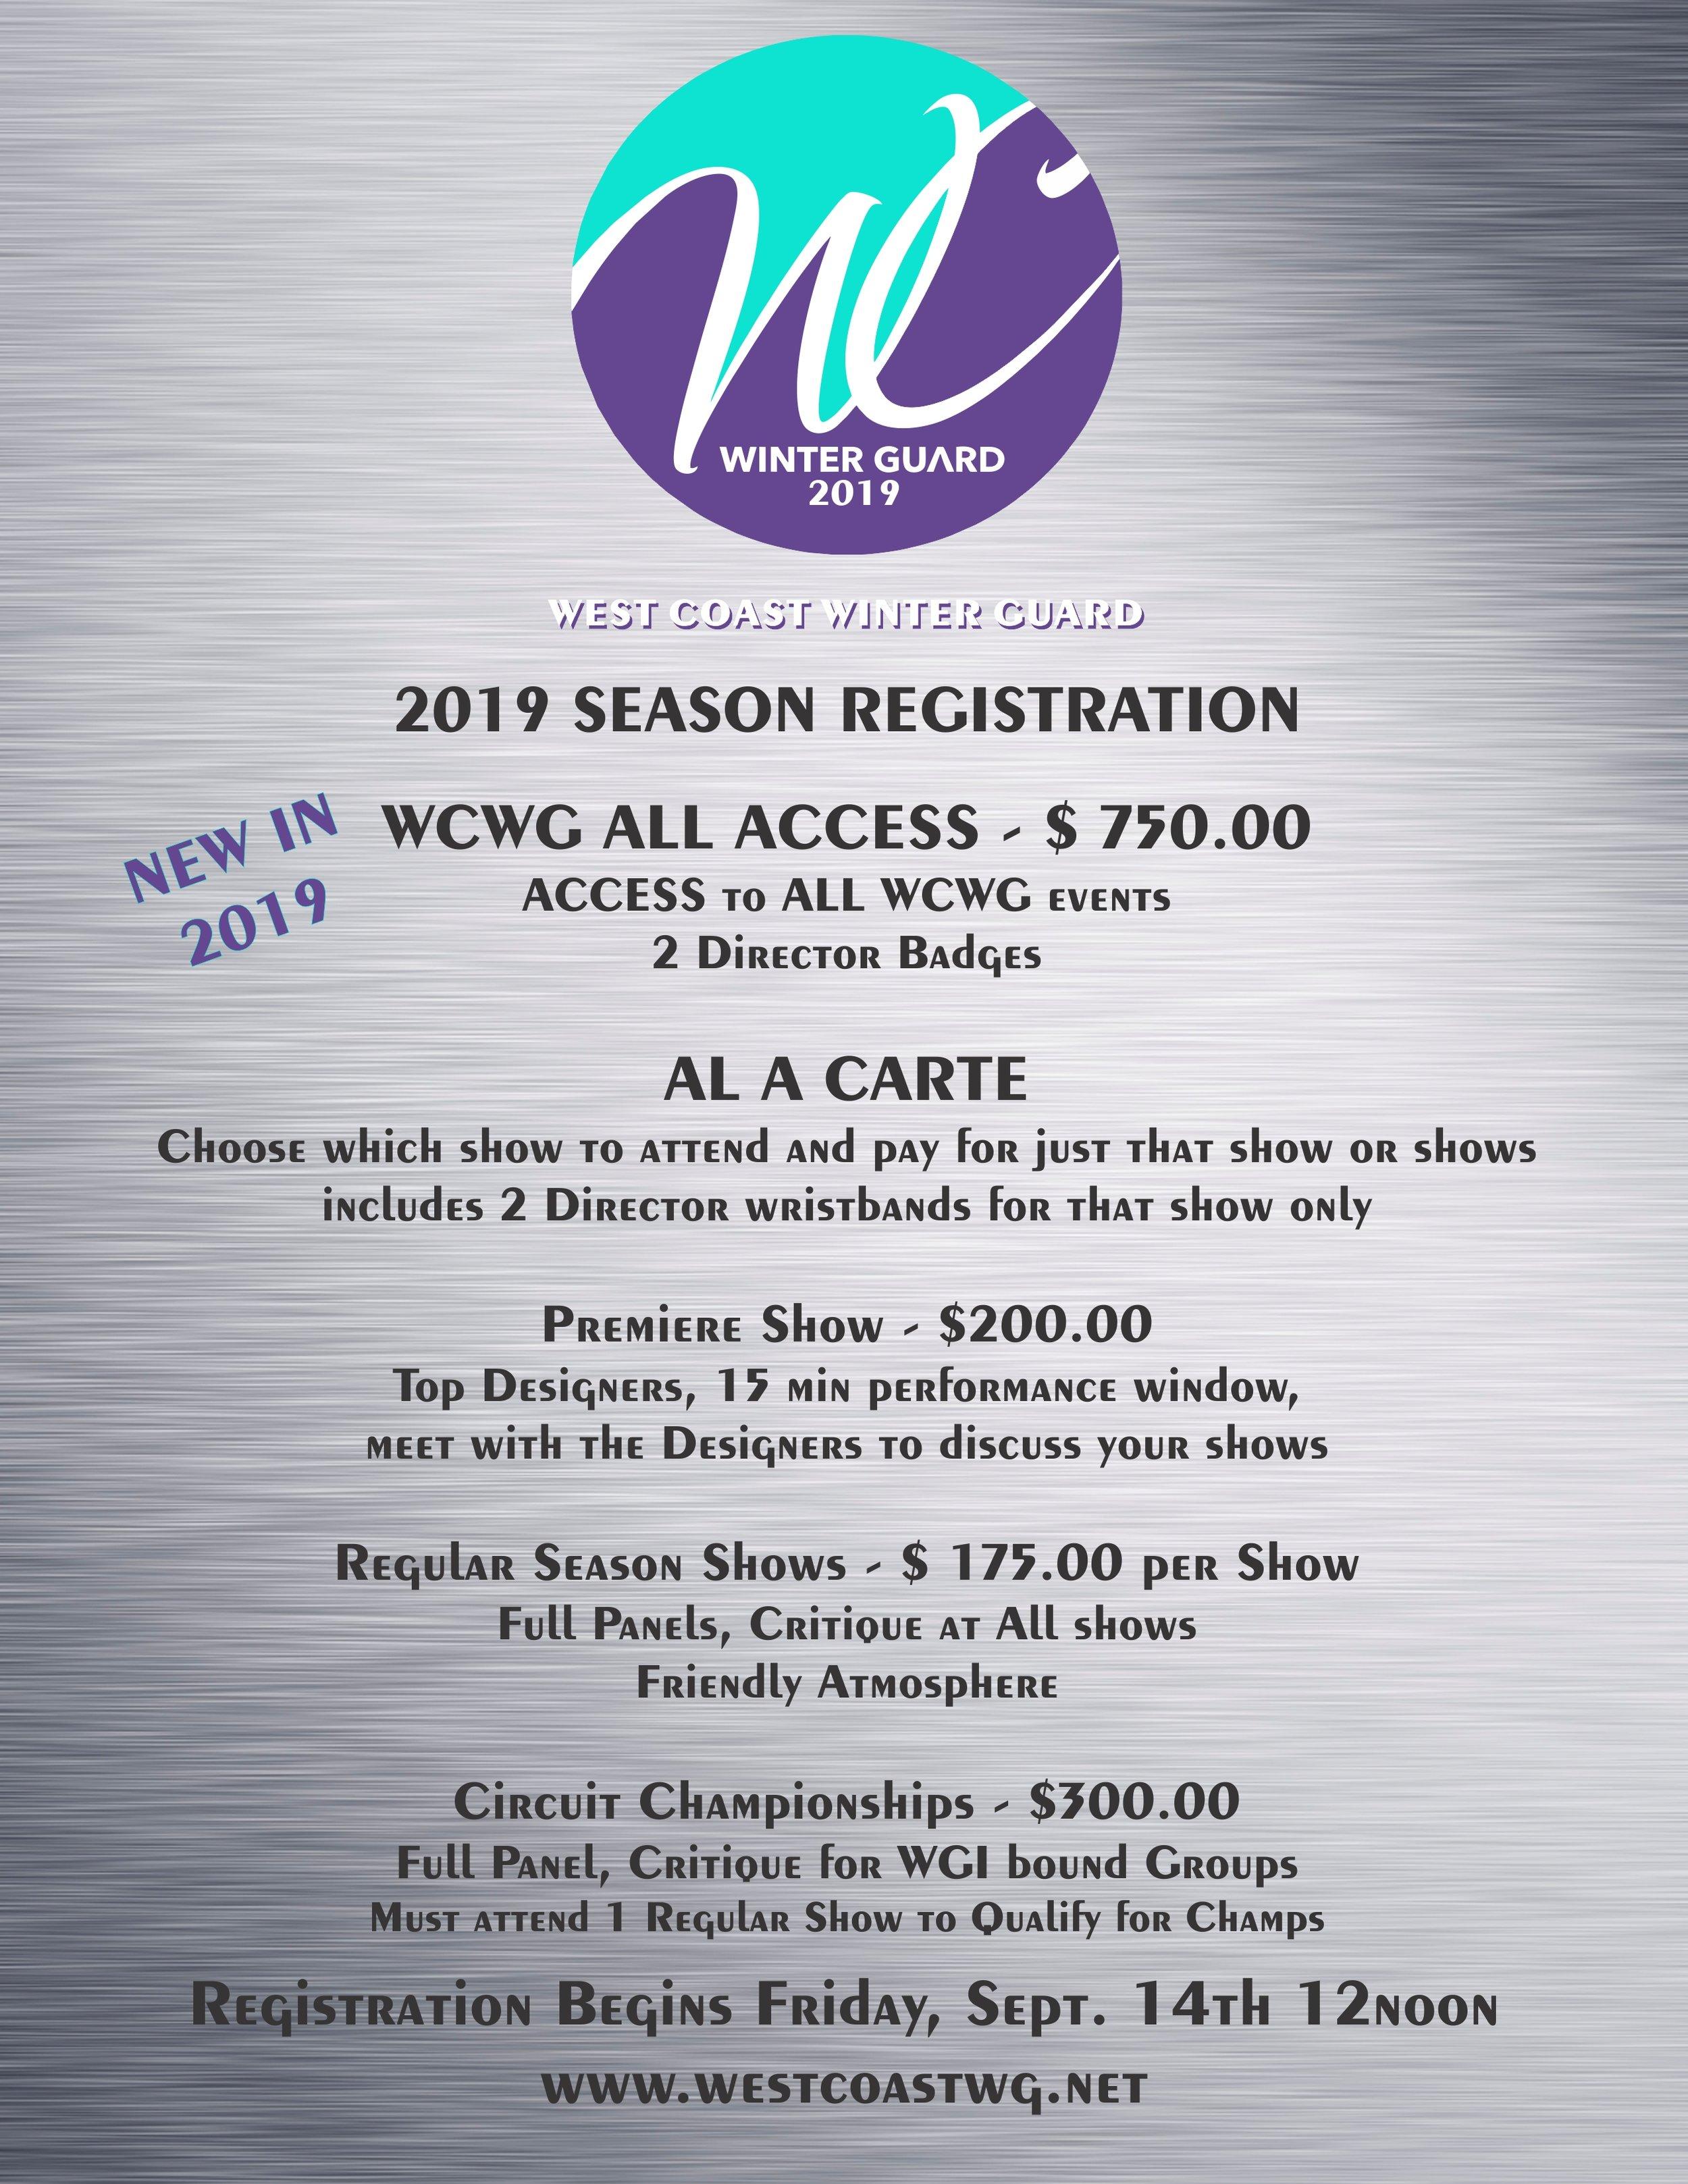 WCWG 2019 Registration Announcement.jpg